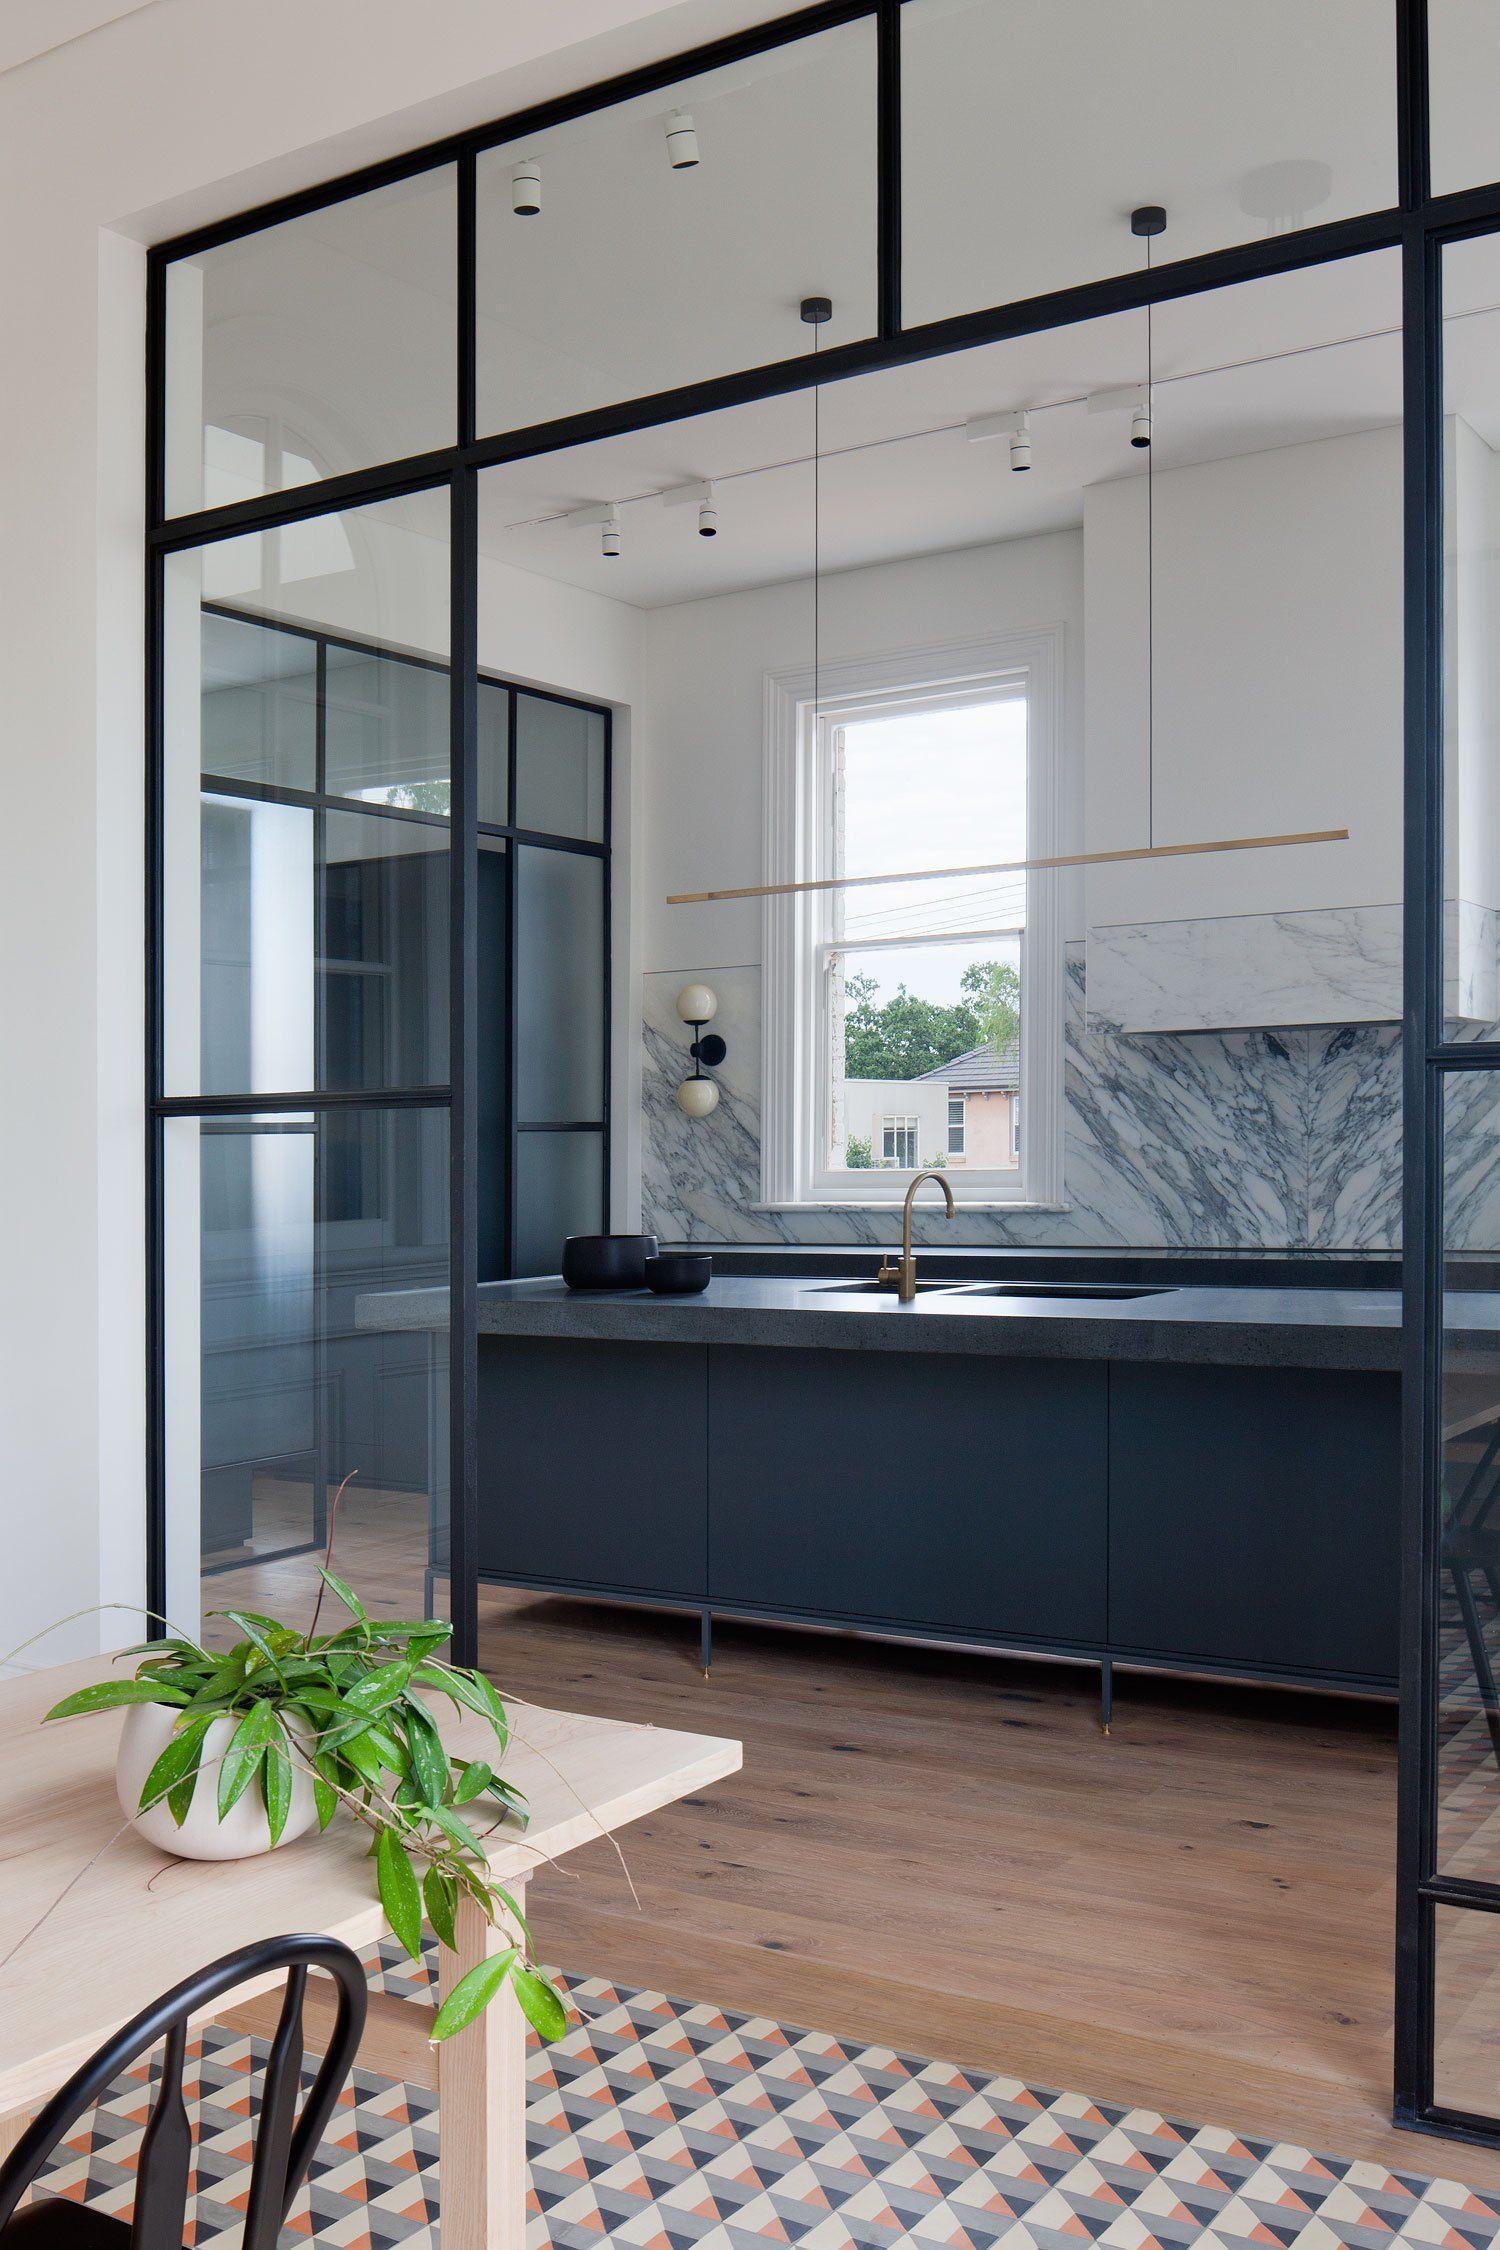 Hecker guthrie transforms men   retirement home into  grand victorian residence yellowtrace also transform interior rh pinterest